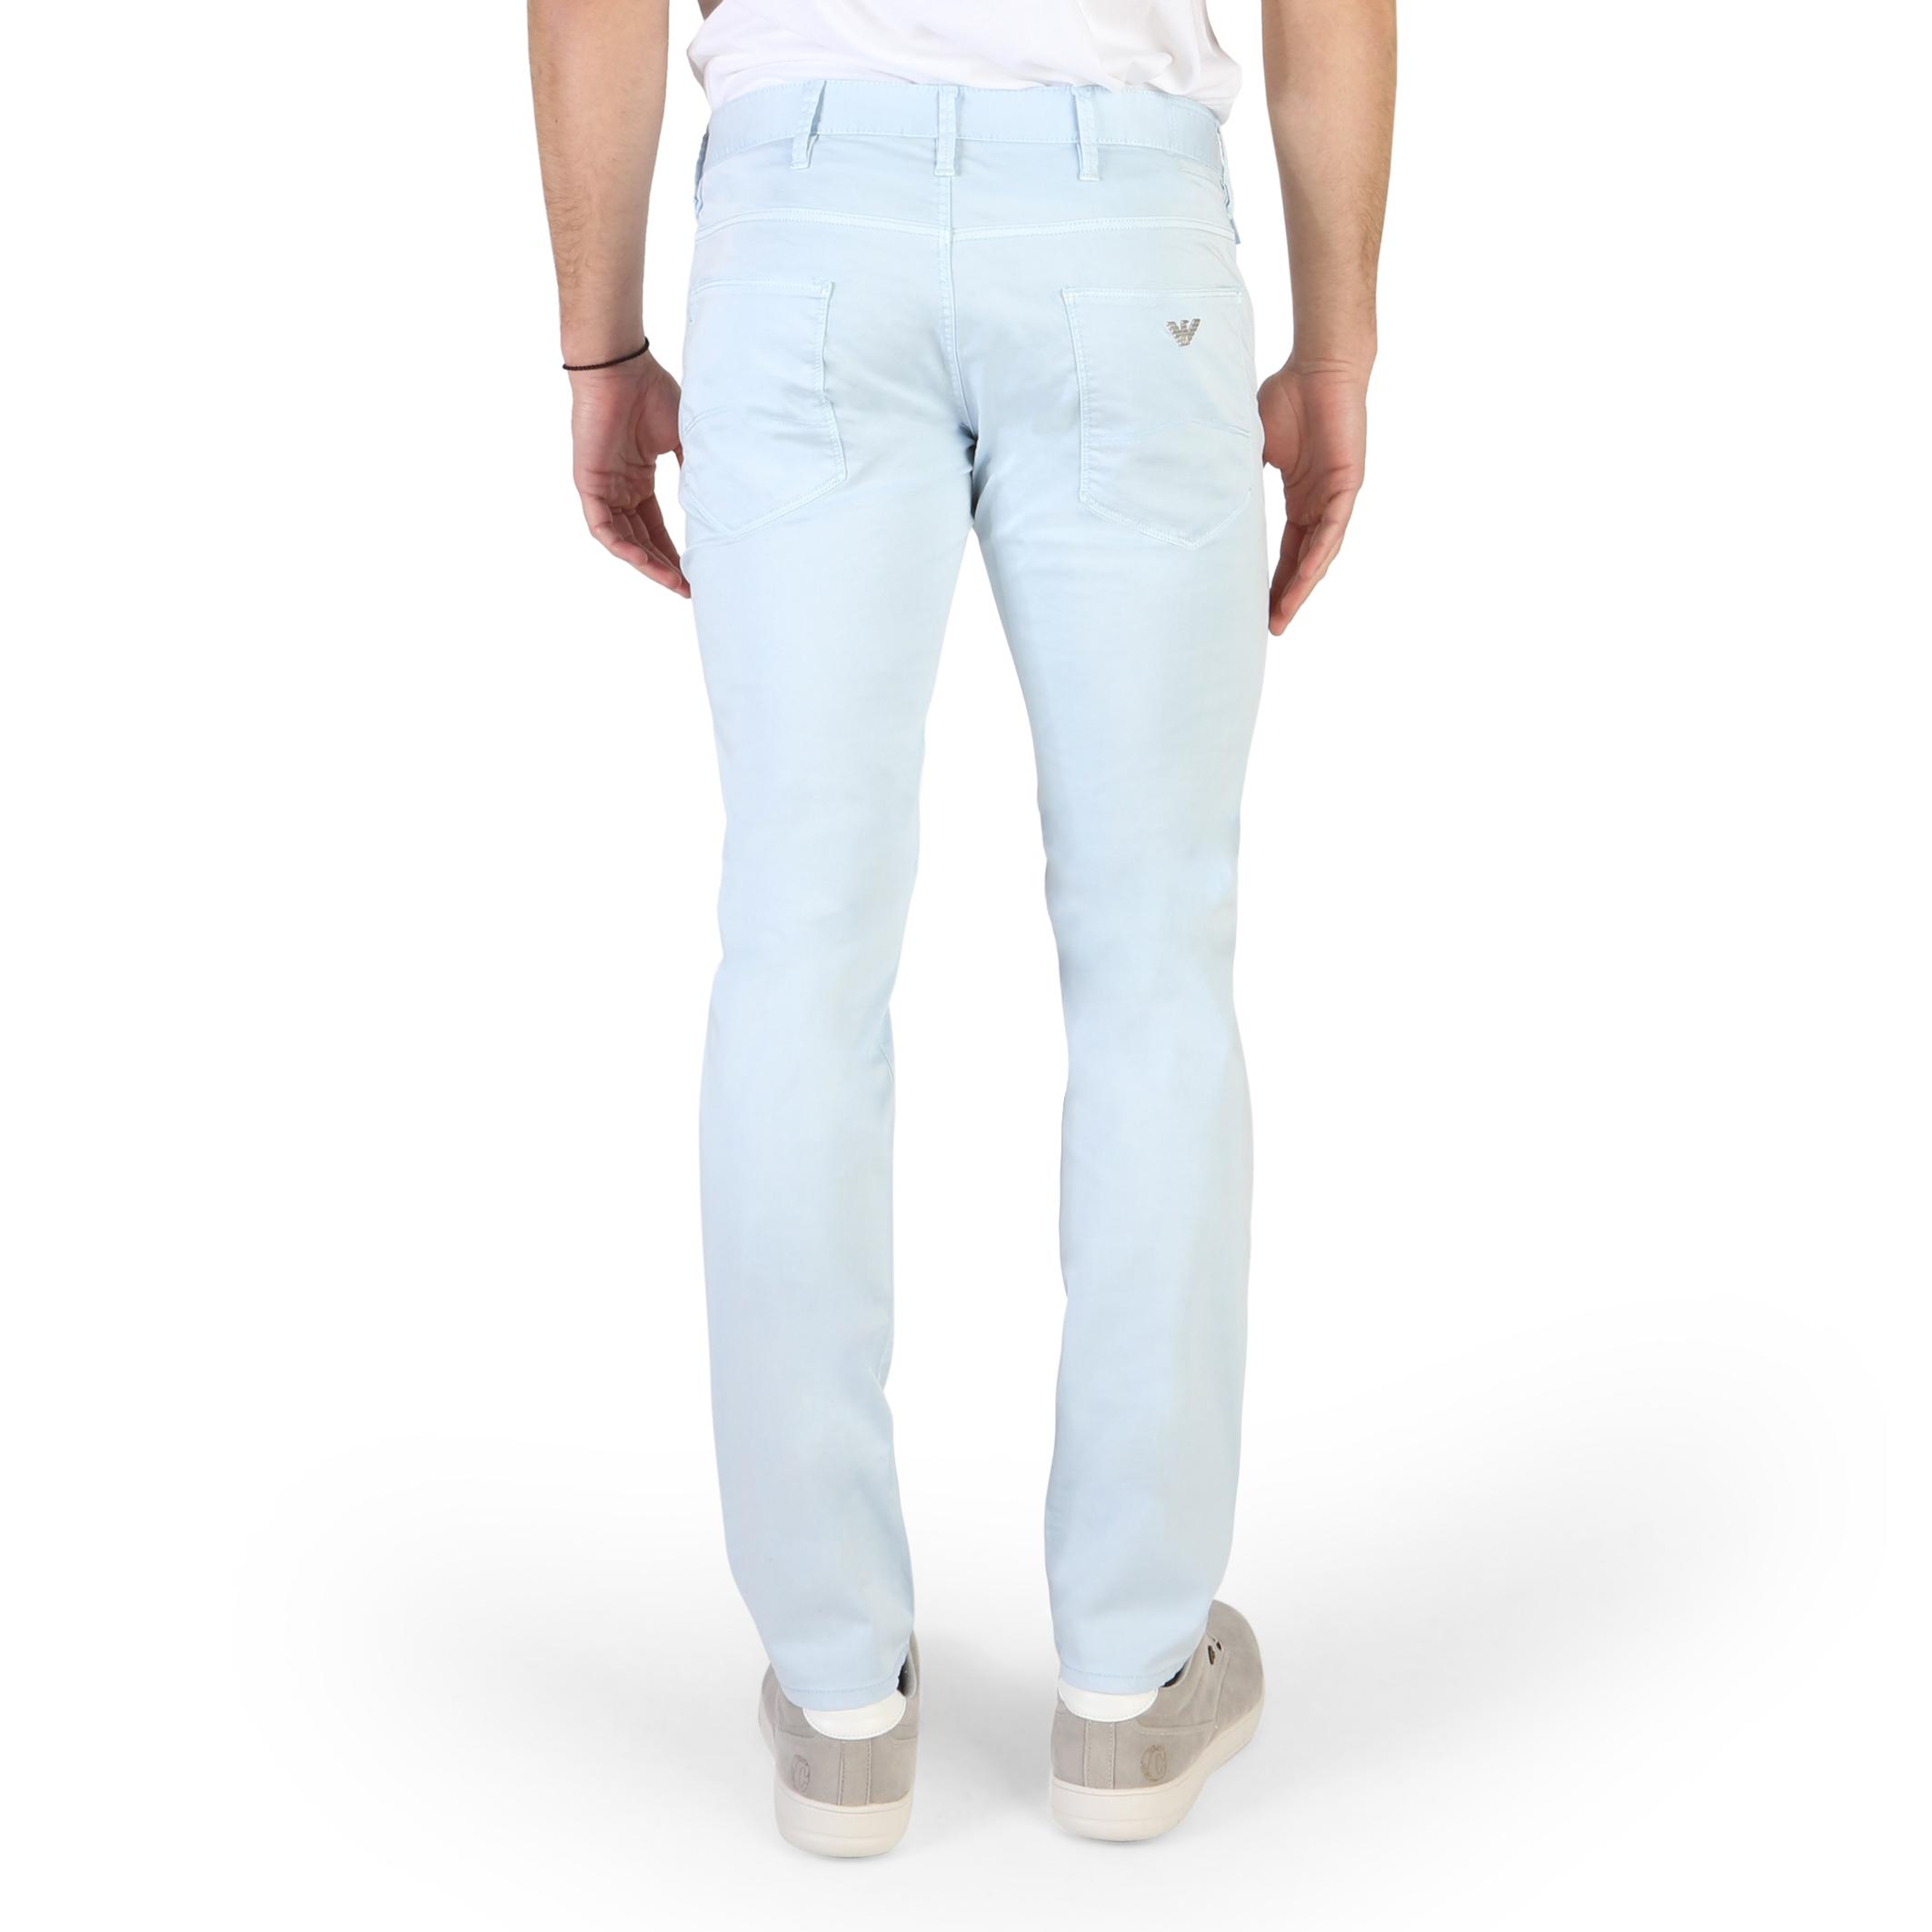 Pantaloni-Armani-Jeans-3Y6J06-6NEDZ-Uomo-Blu-106804 miniatura 2